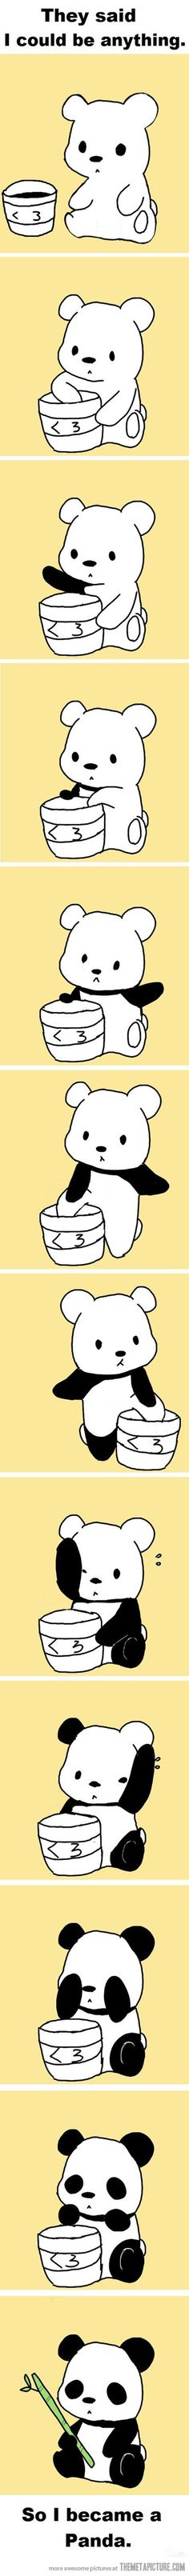 All bears just wanna be a panda bear